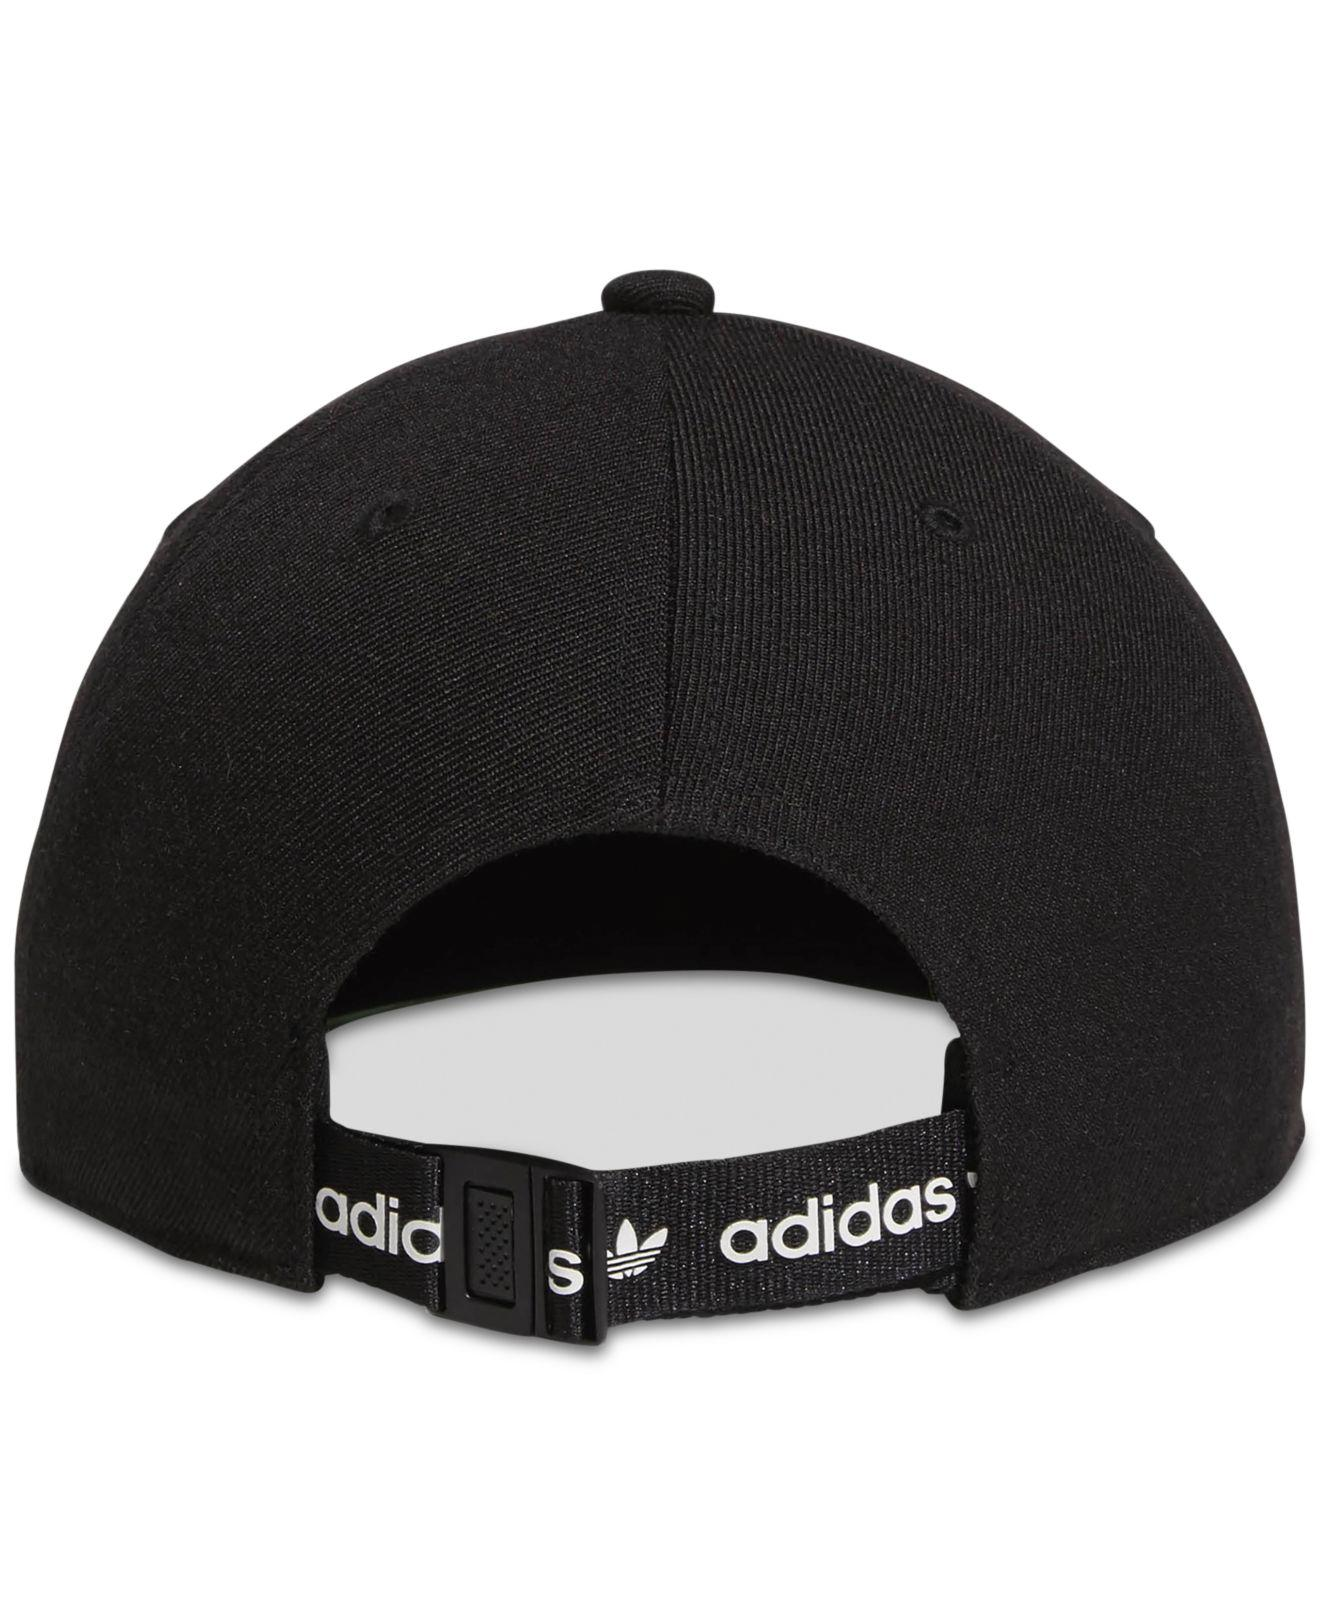 949b1e21 Lyst - adidas Originals Relaxed Banner-logo Cap in Black for Men